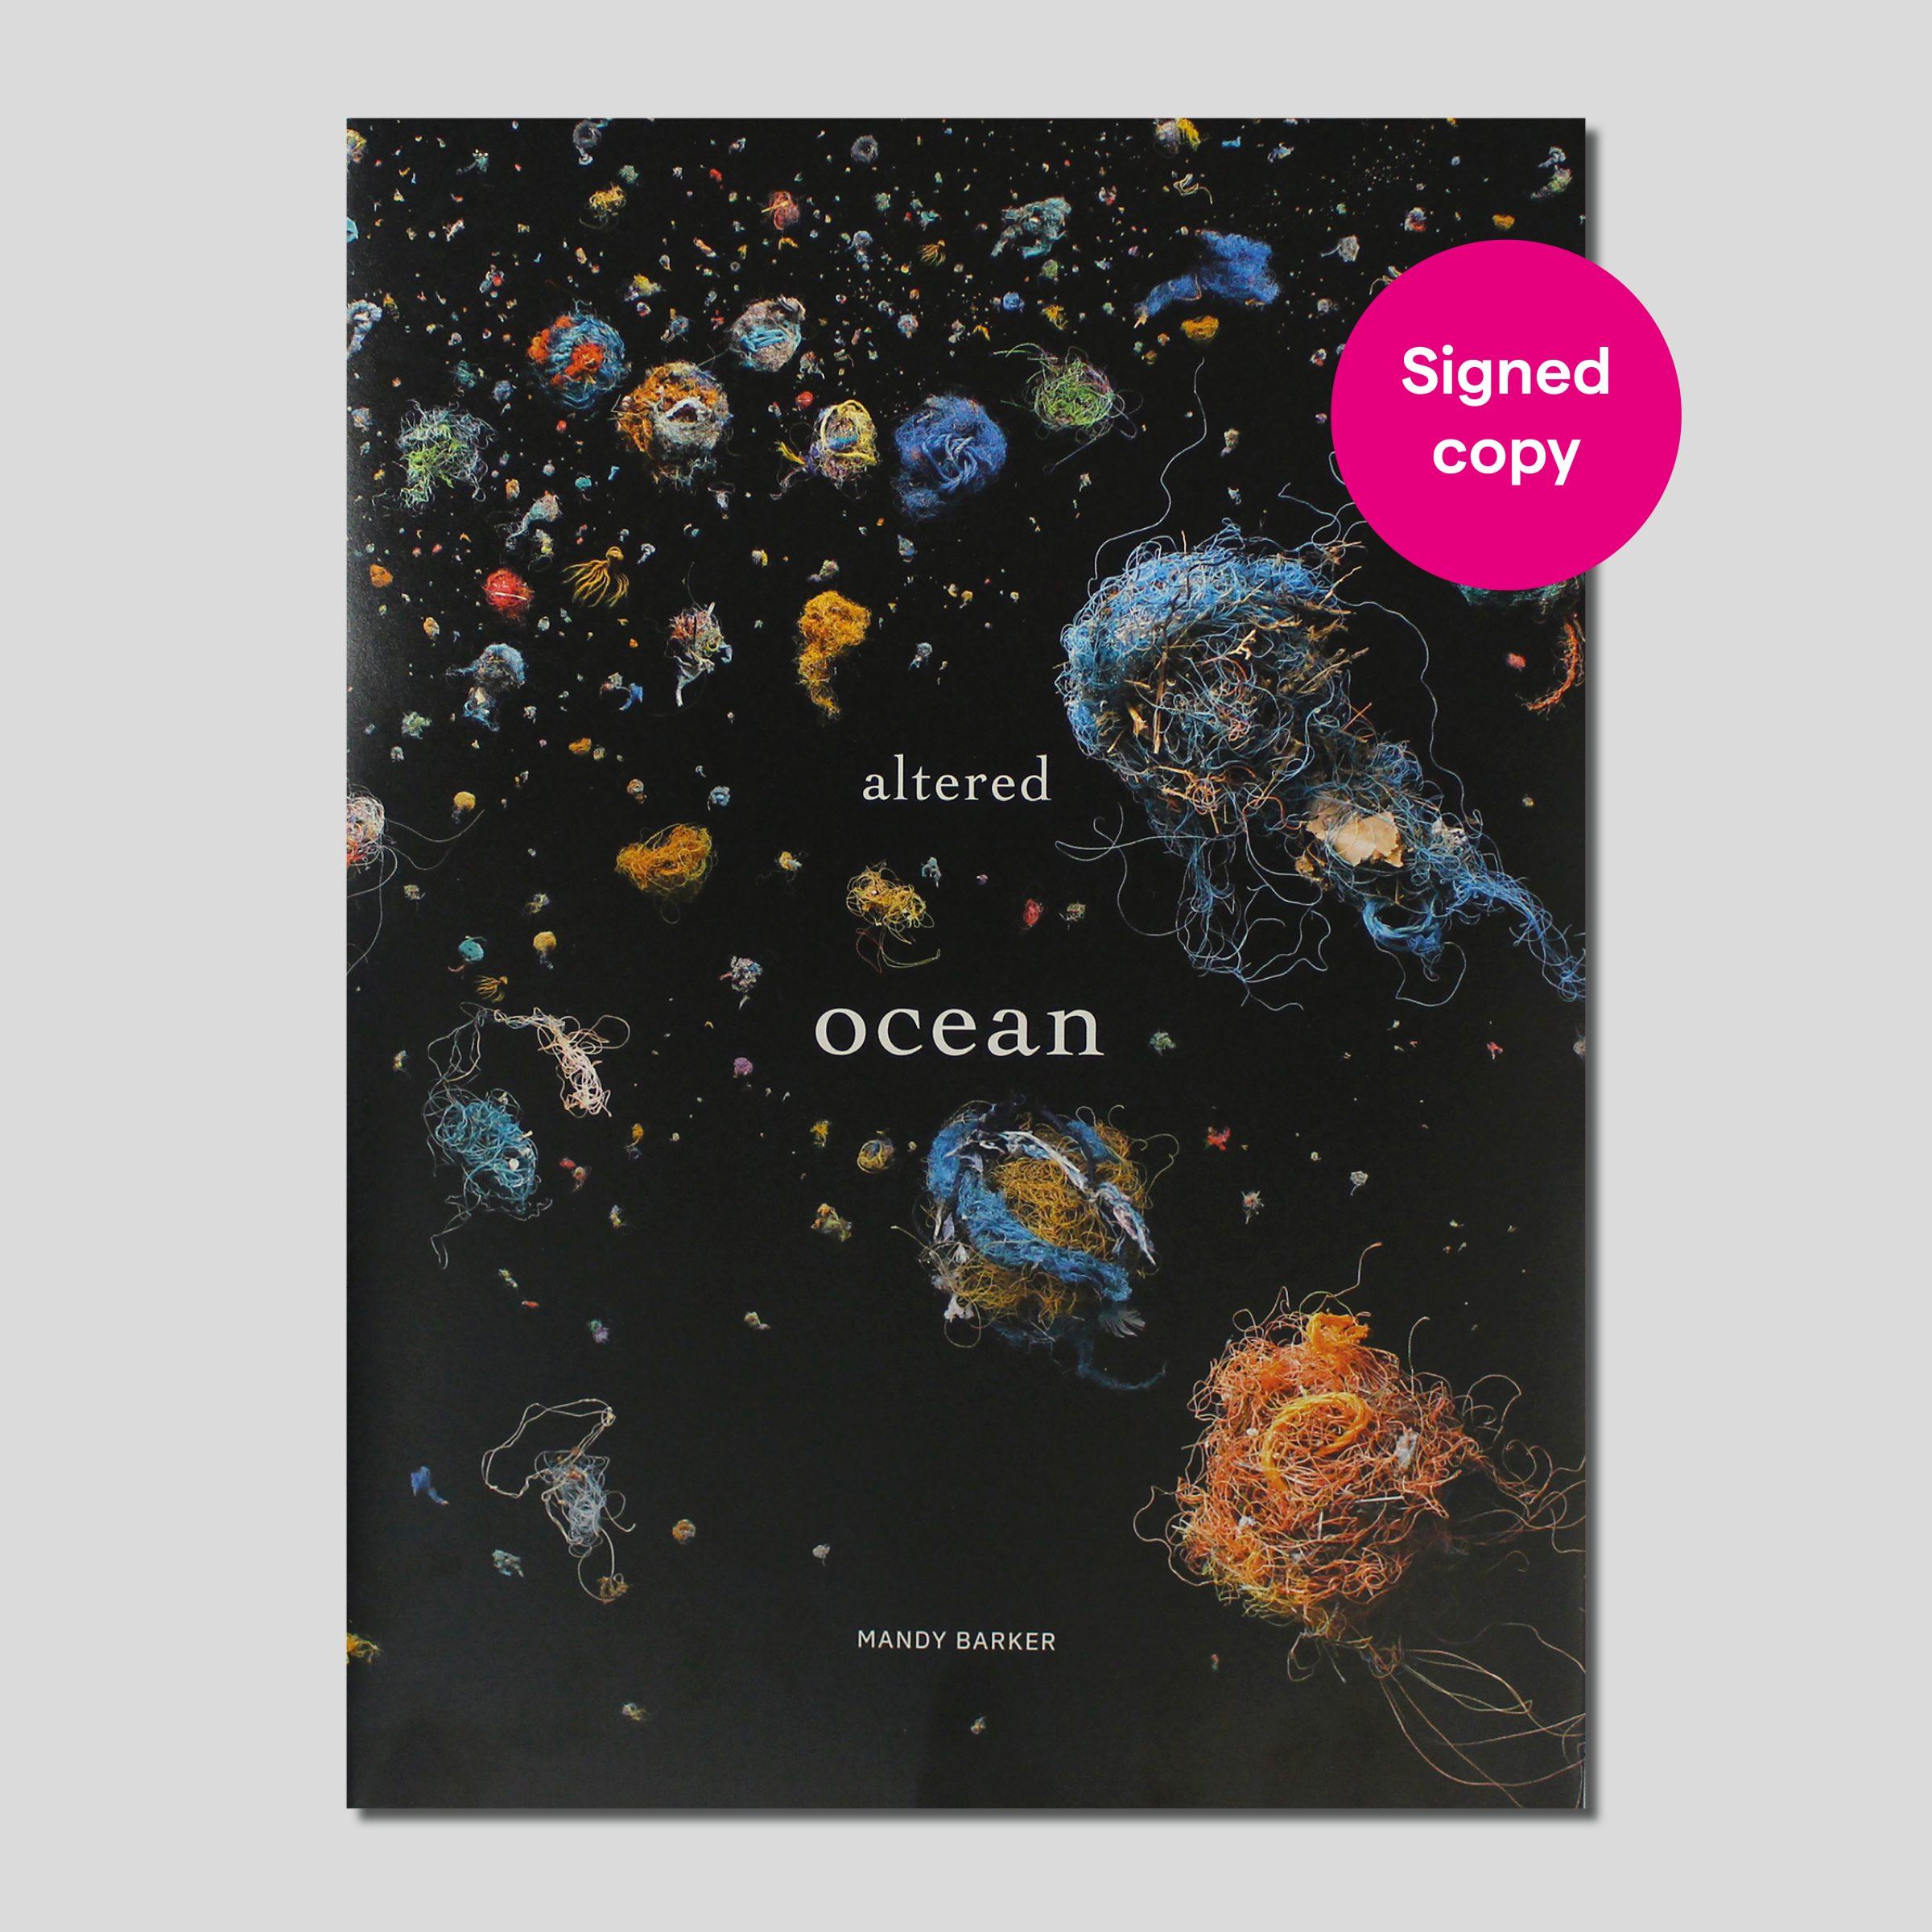 Altered Ocean by Mandy Barker signed